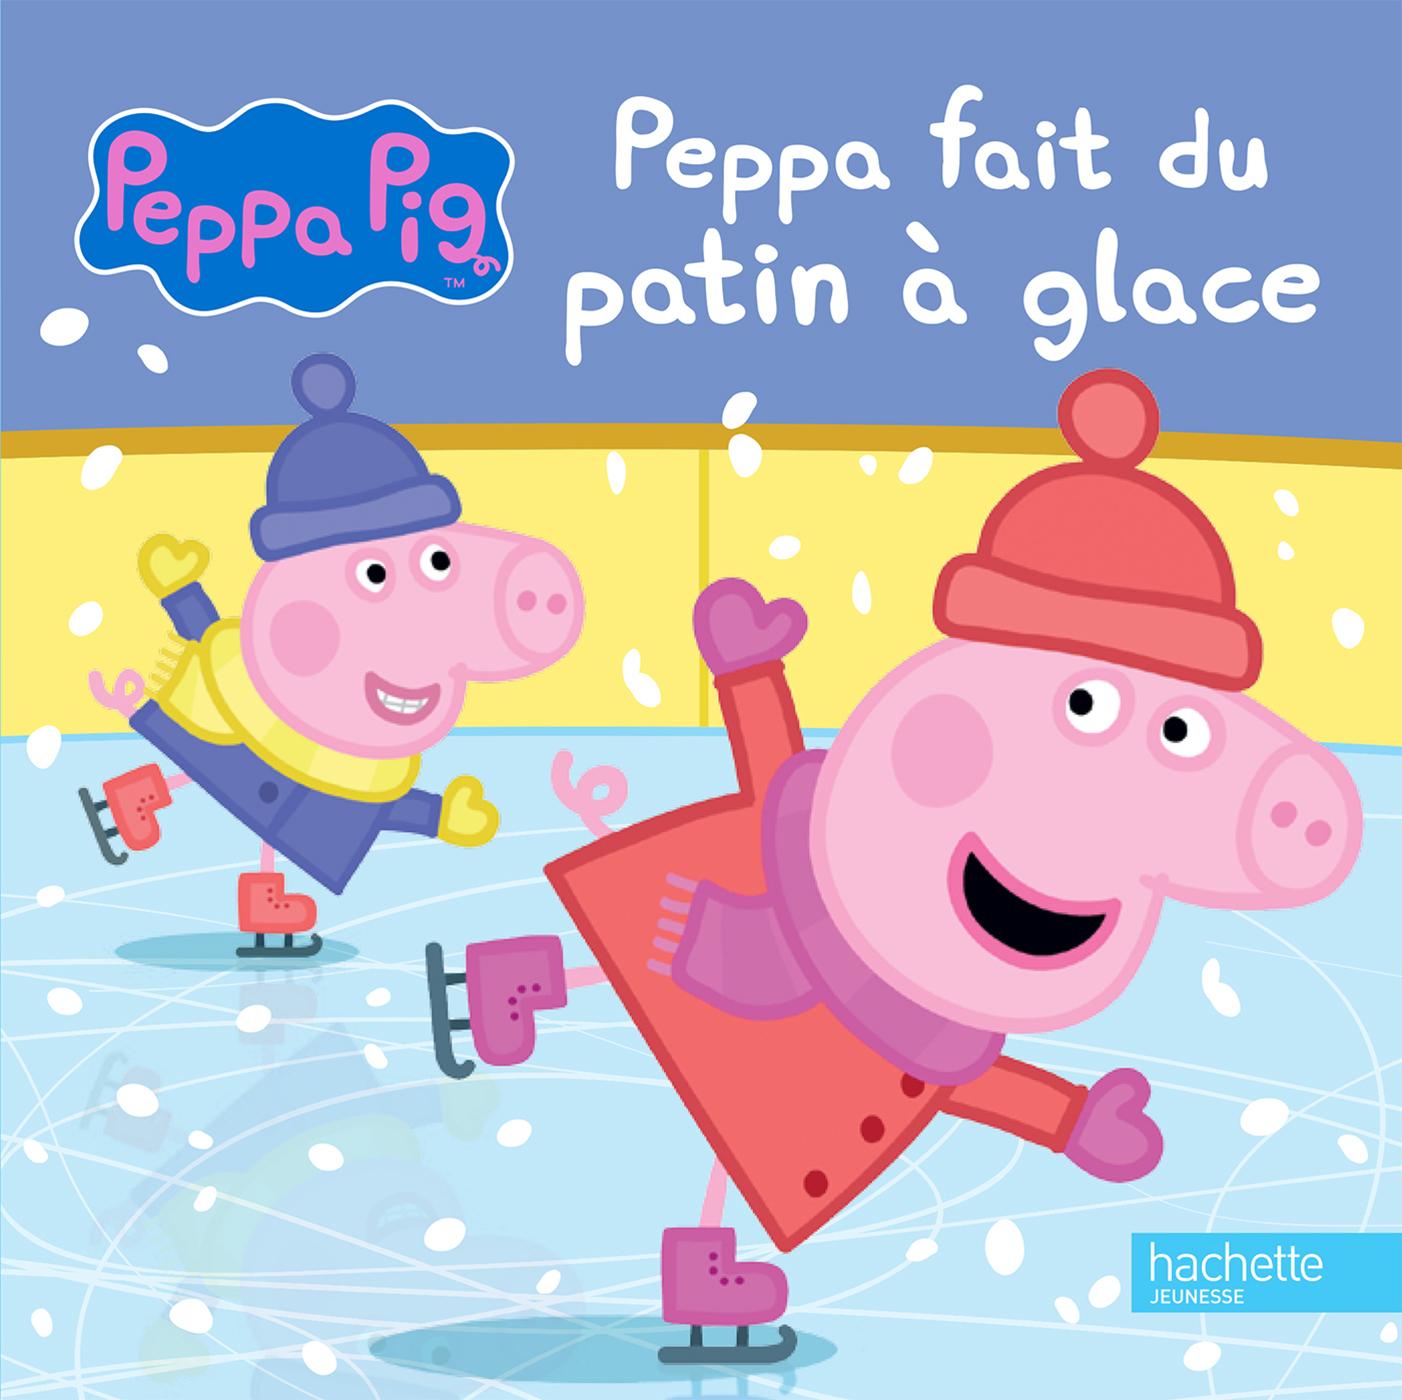 PEPPA PIG - PEPPA FAIT DU PATIN A GLACE